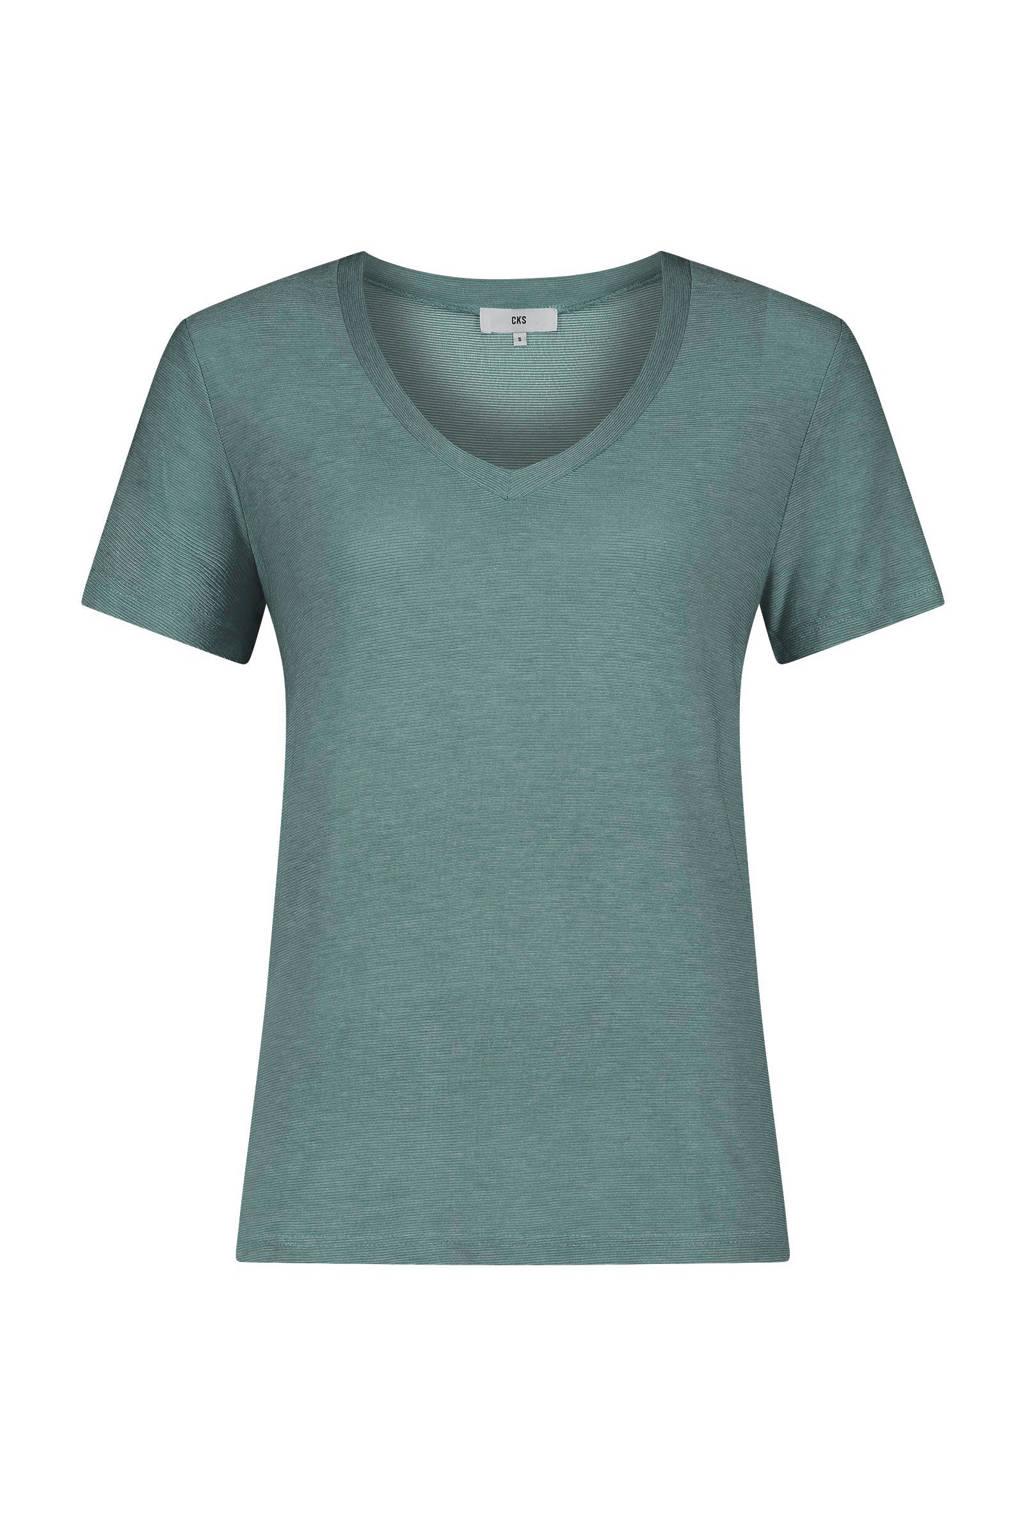 CKS Ebony T-shirt groen, Groen